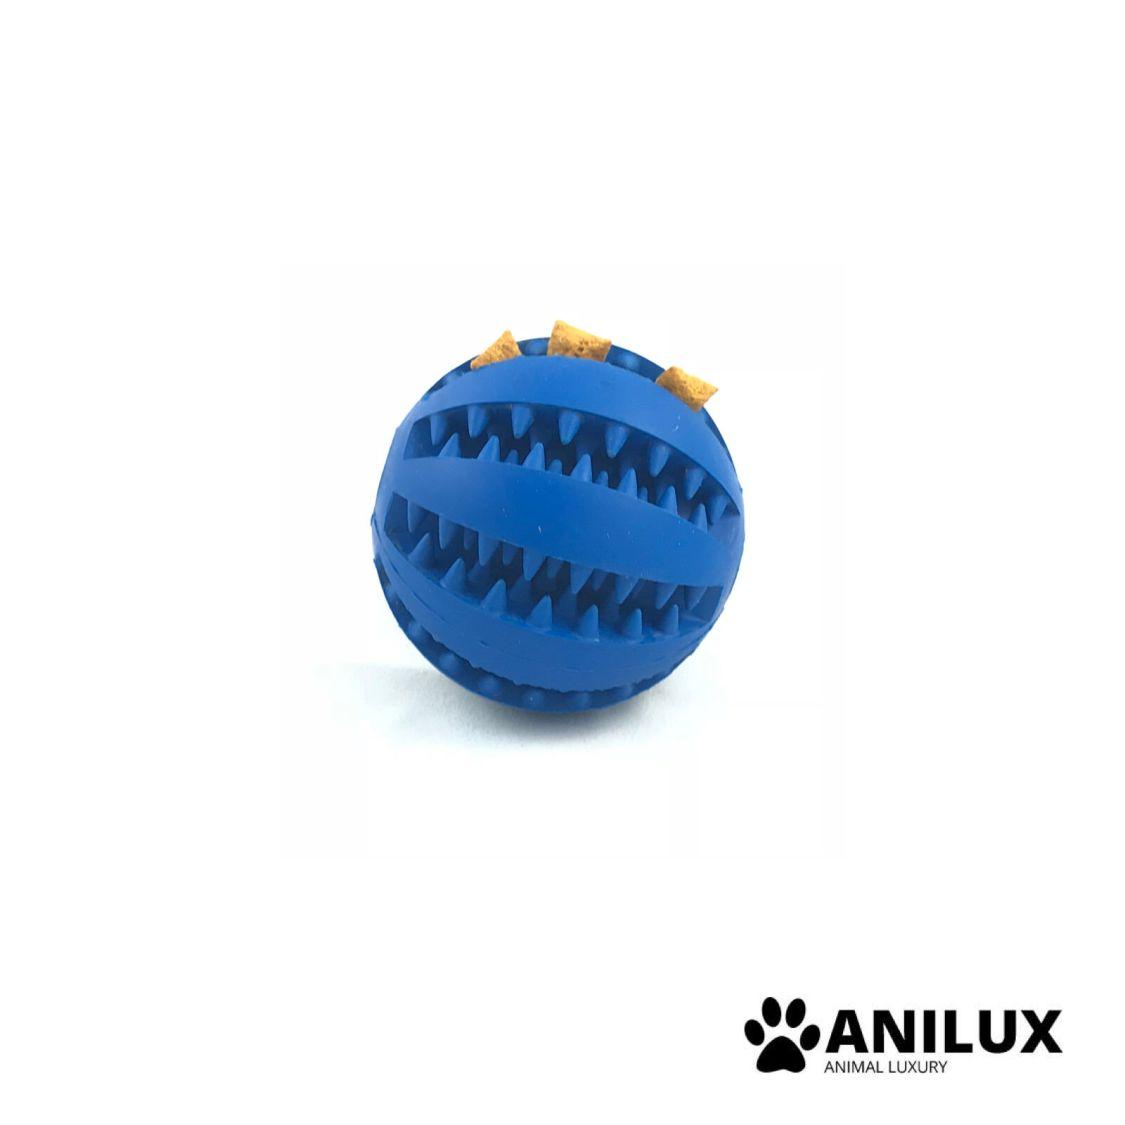 Dental Hunde Spielzeug Ball Kauspielzeug Snackball Zahnpflege Futterball